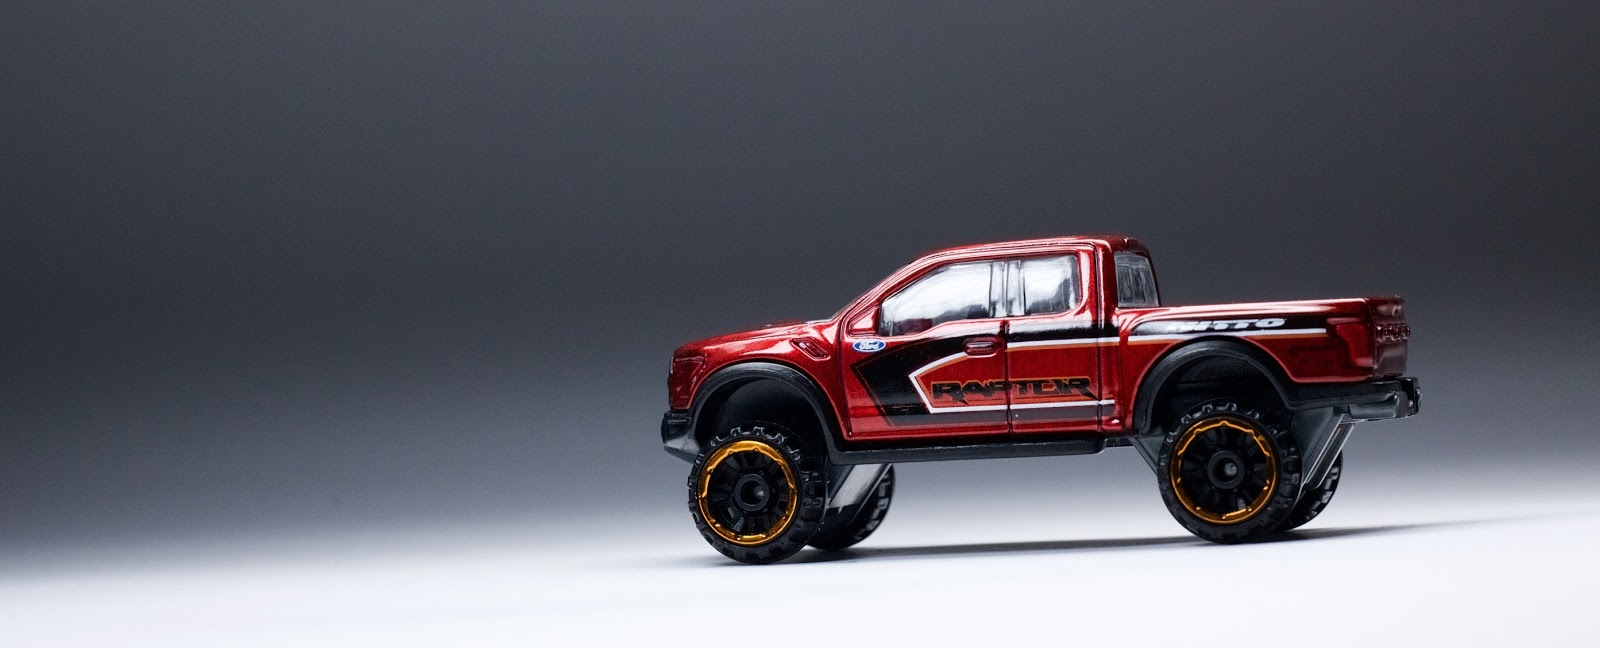 2018 Chevrolet Camaro Hot Wheels Edition Upcomingcarshq Com